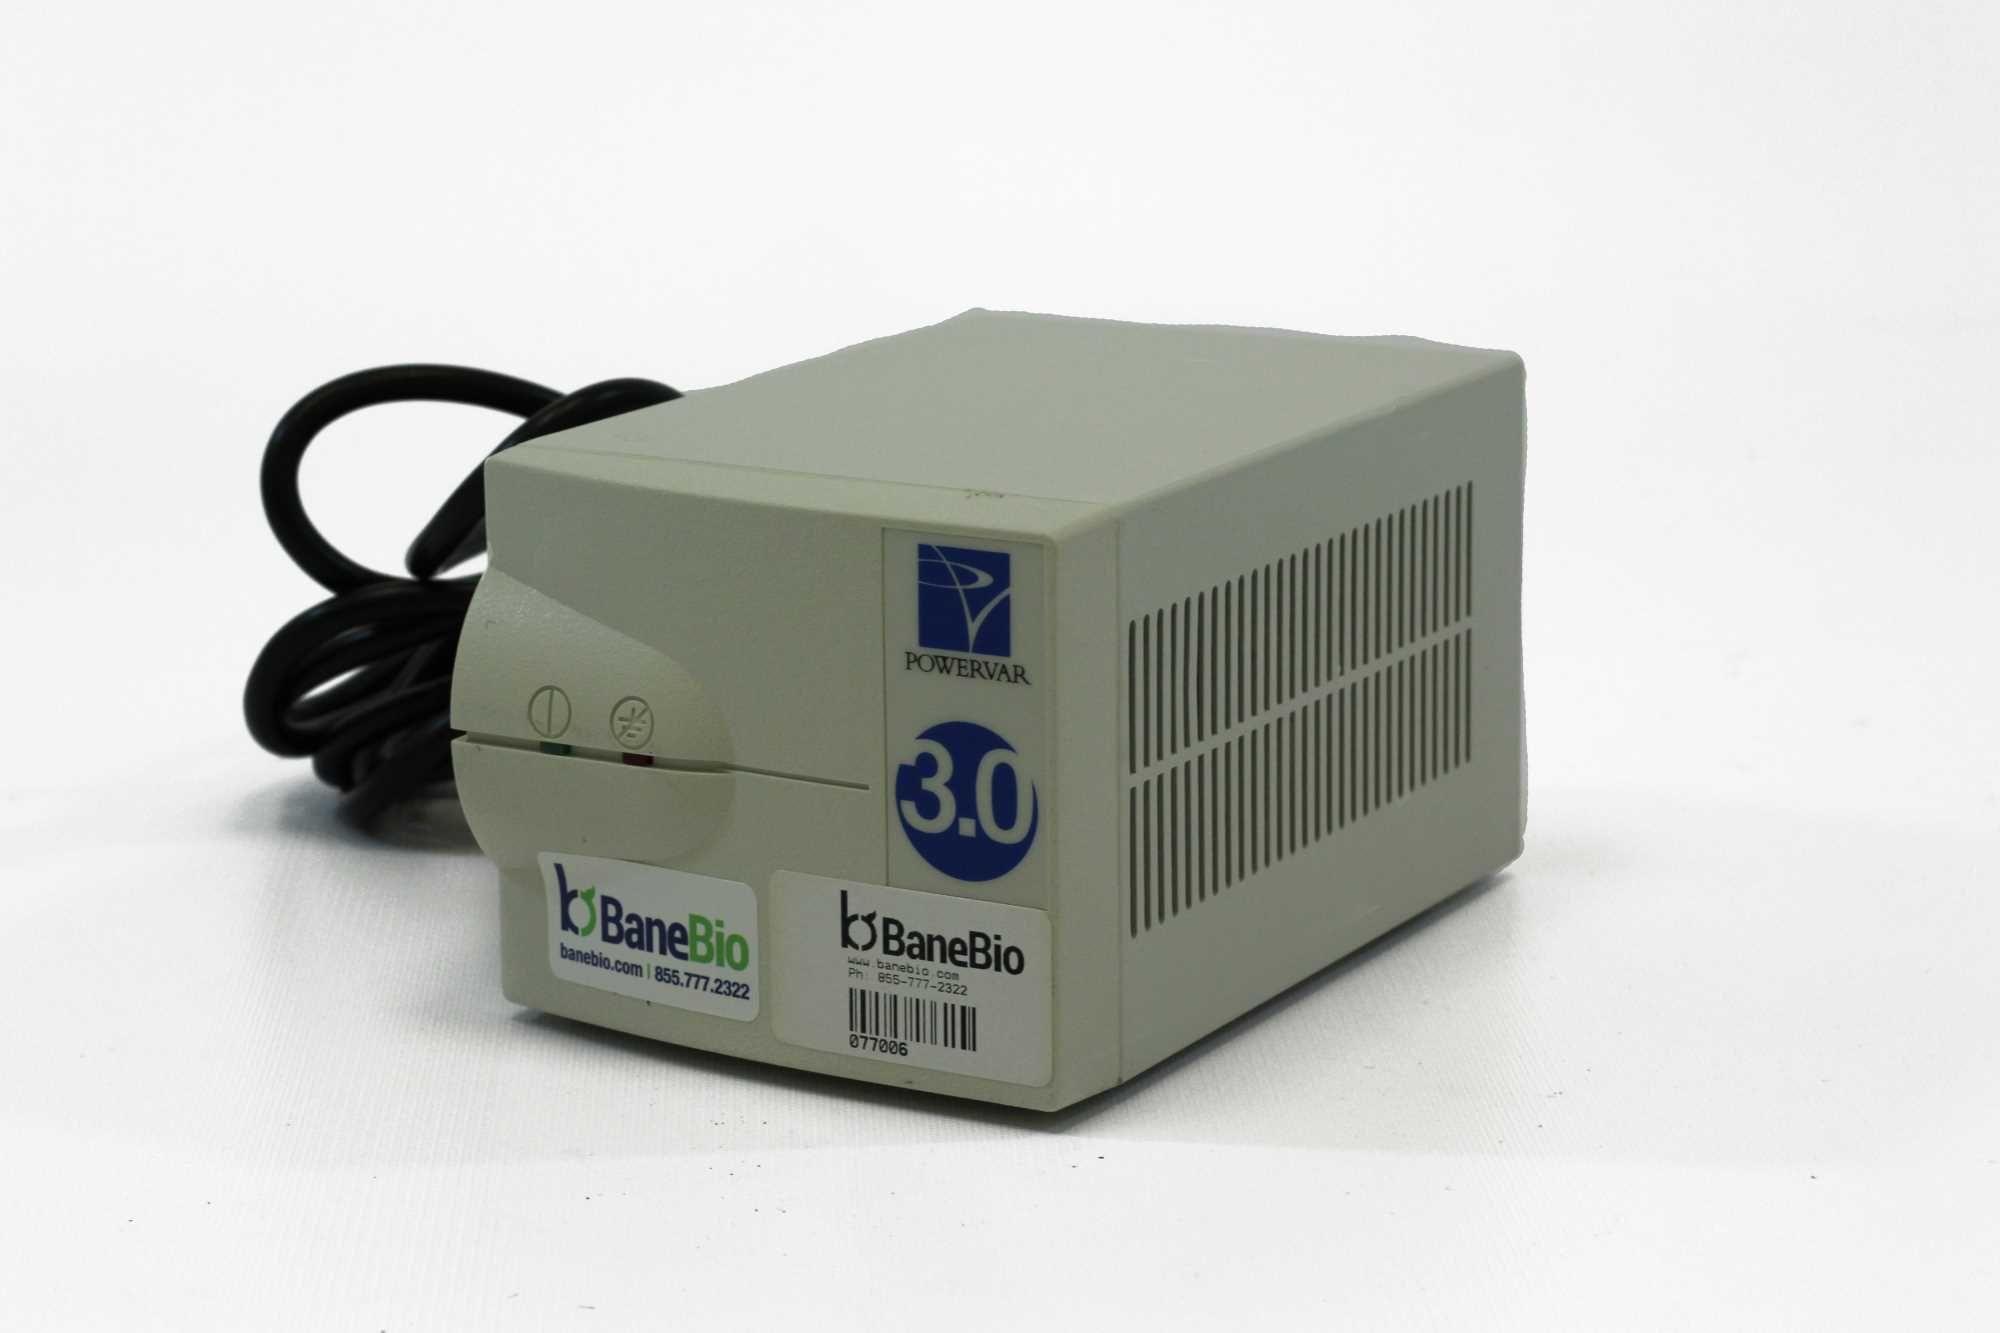 Powervar 3.0 Power Conditioner ABC302-11